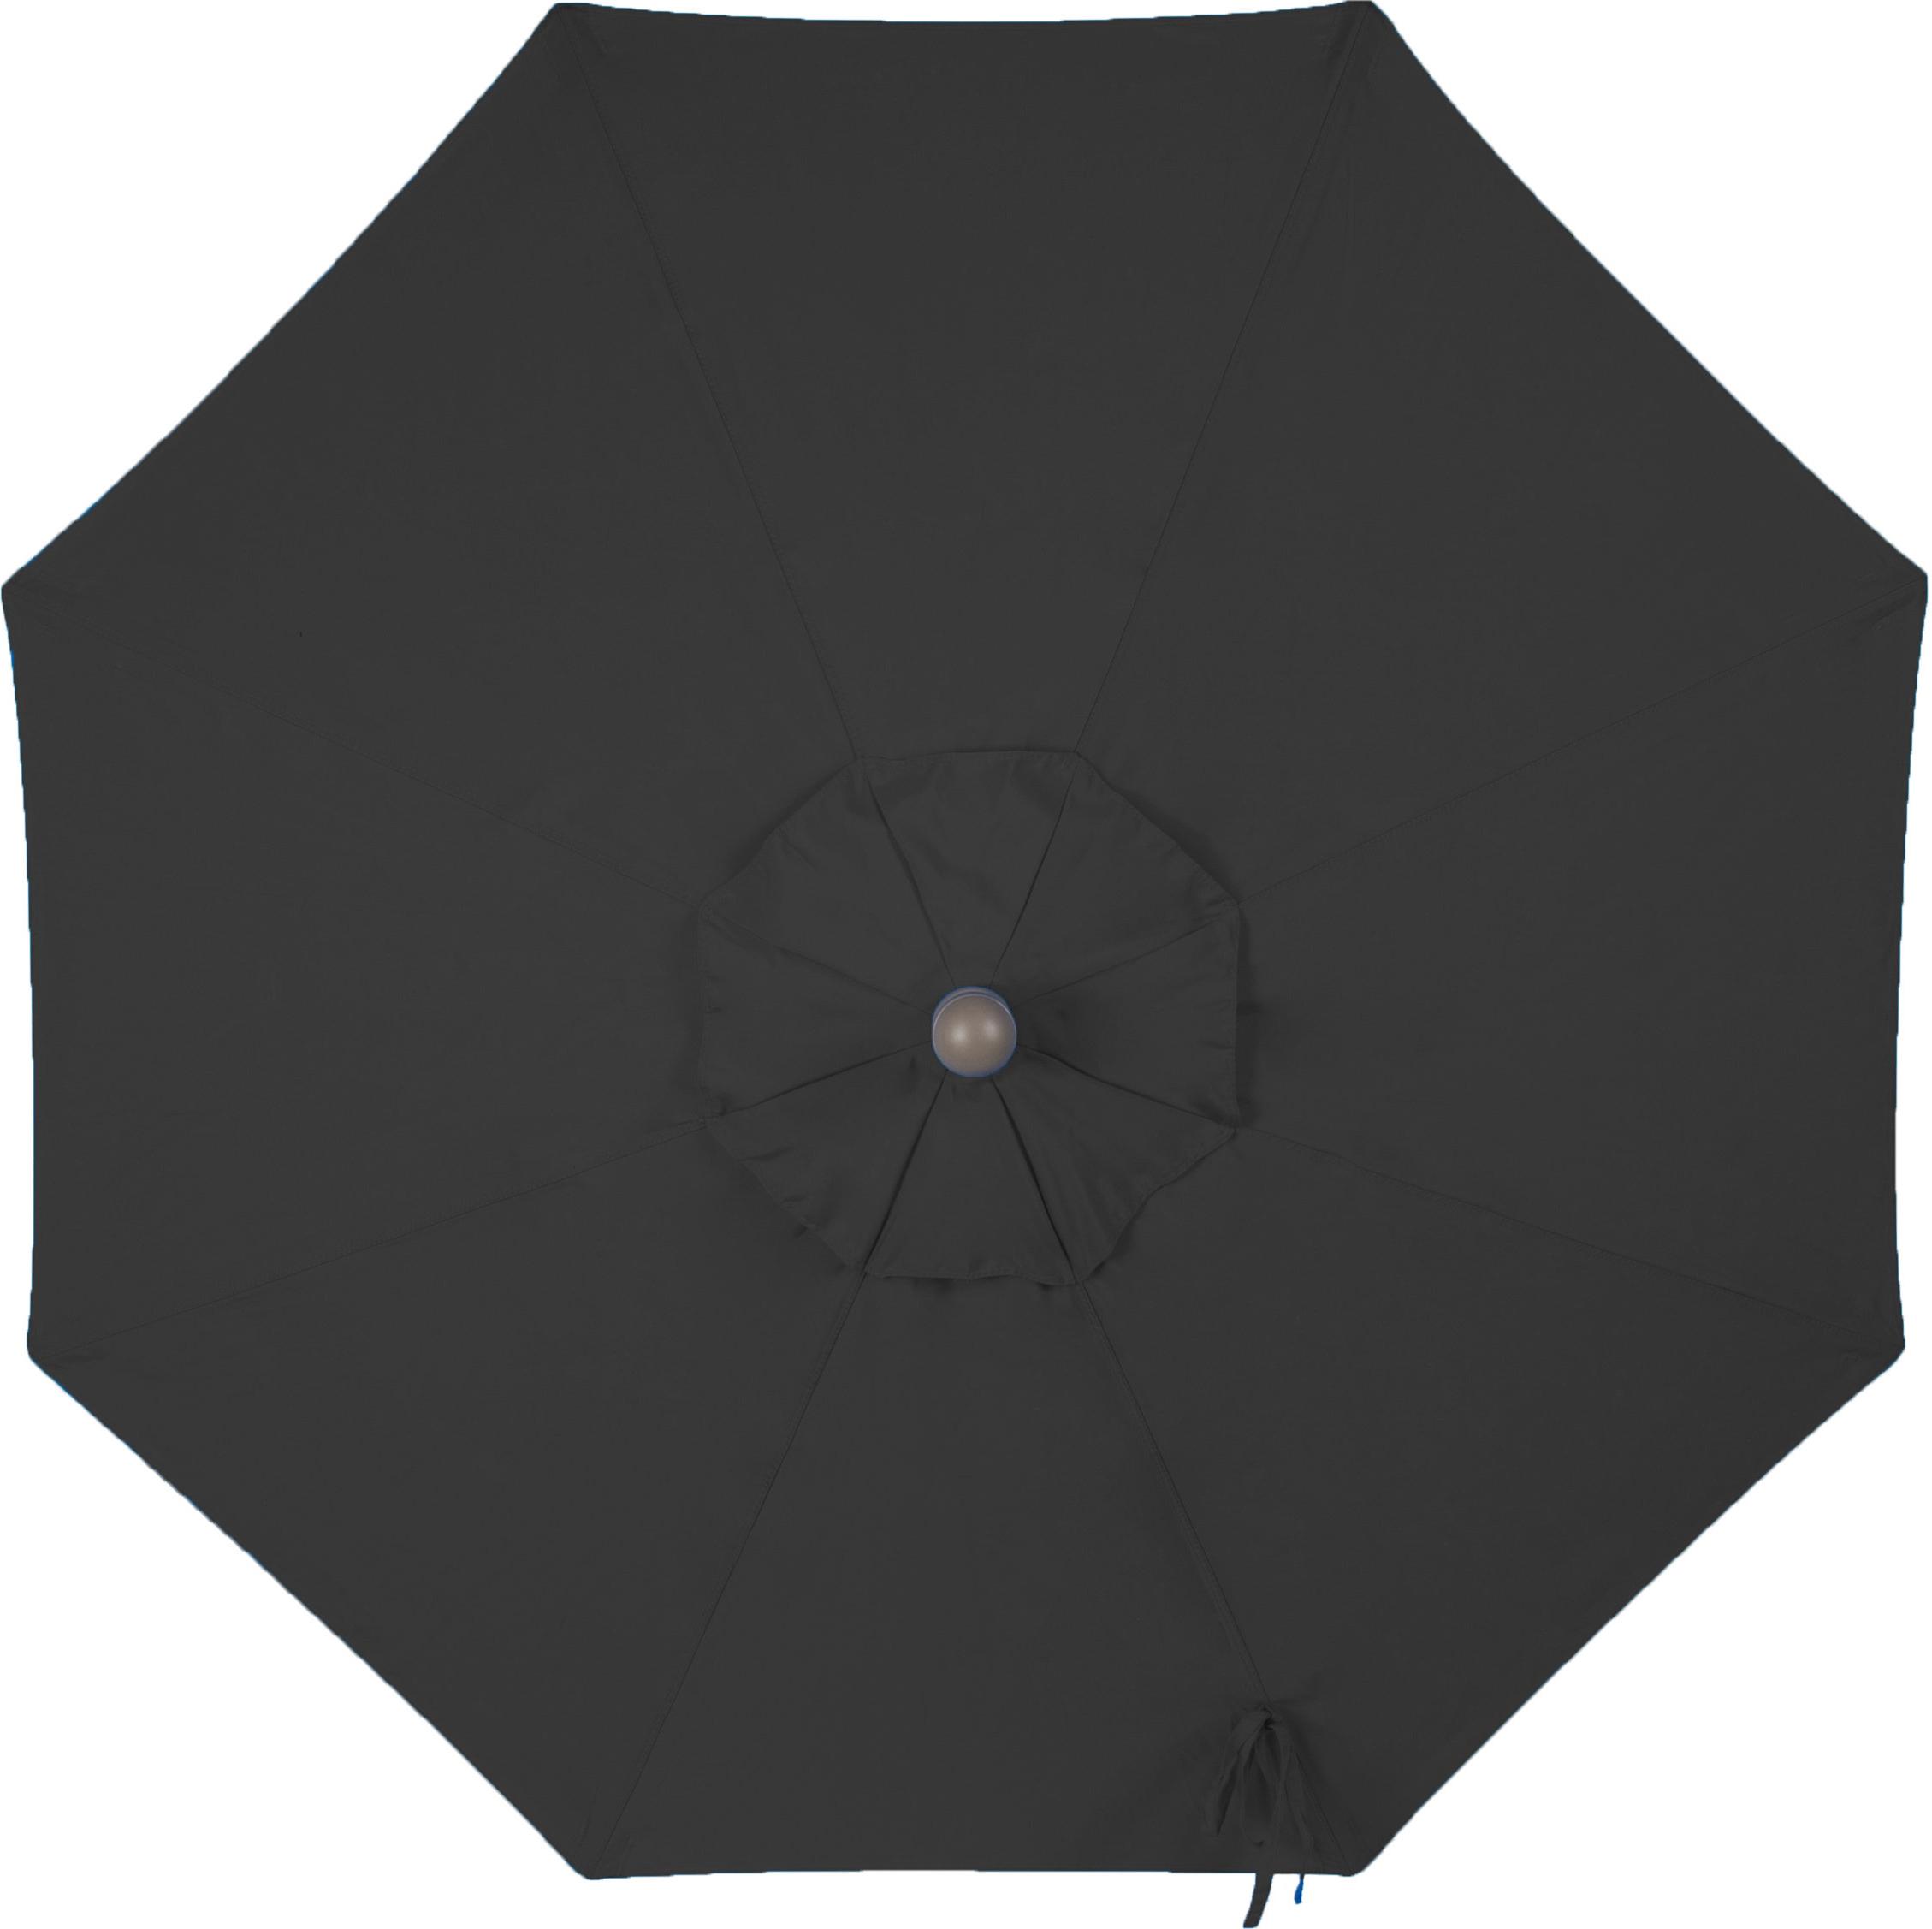 Favorite Wiechmann 9' Market Sunbrella Umbrella Within Wiechmann Market Sunbrella Umbrellas (View 5 of 20)